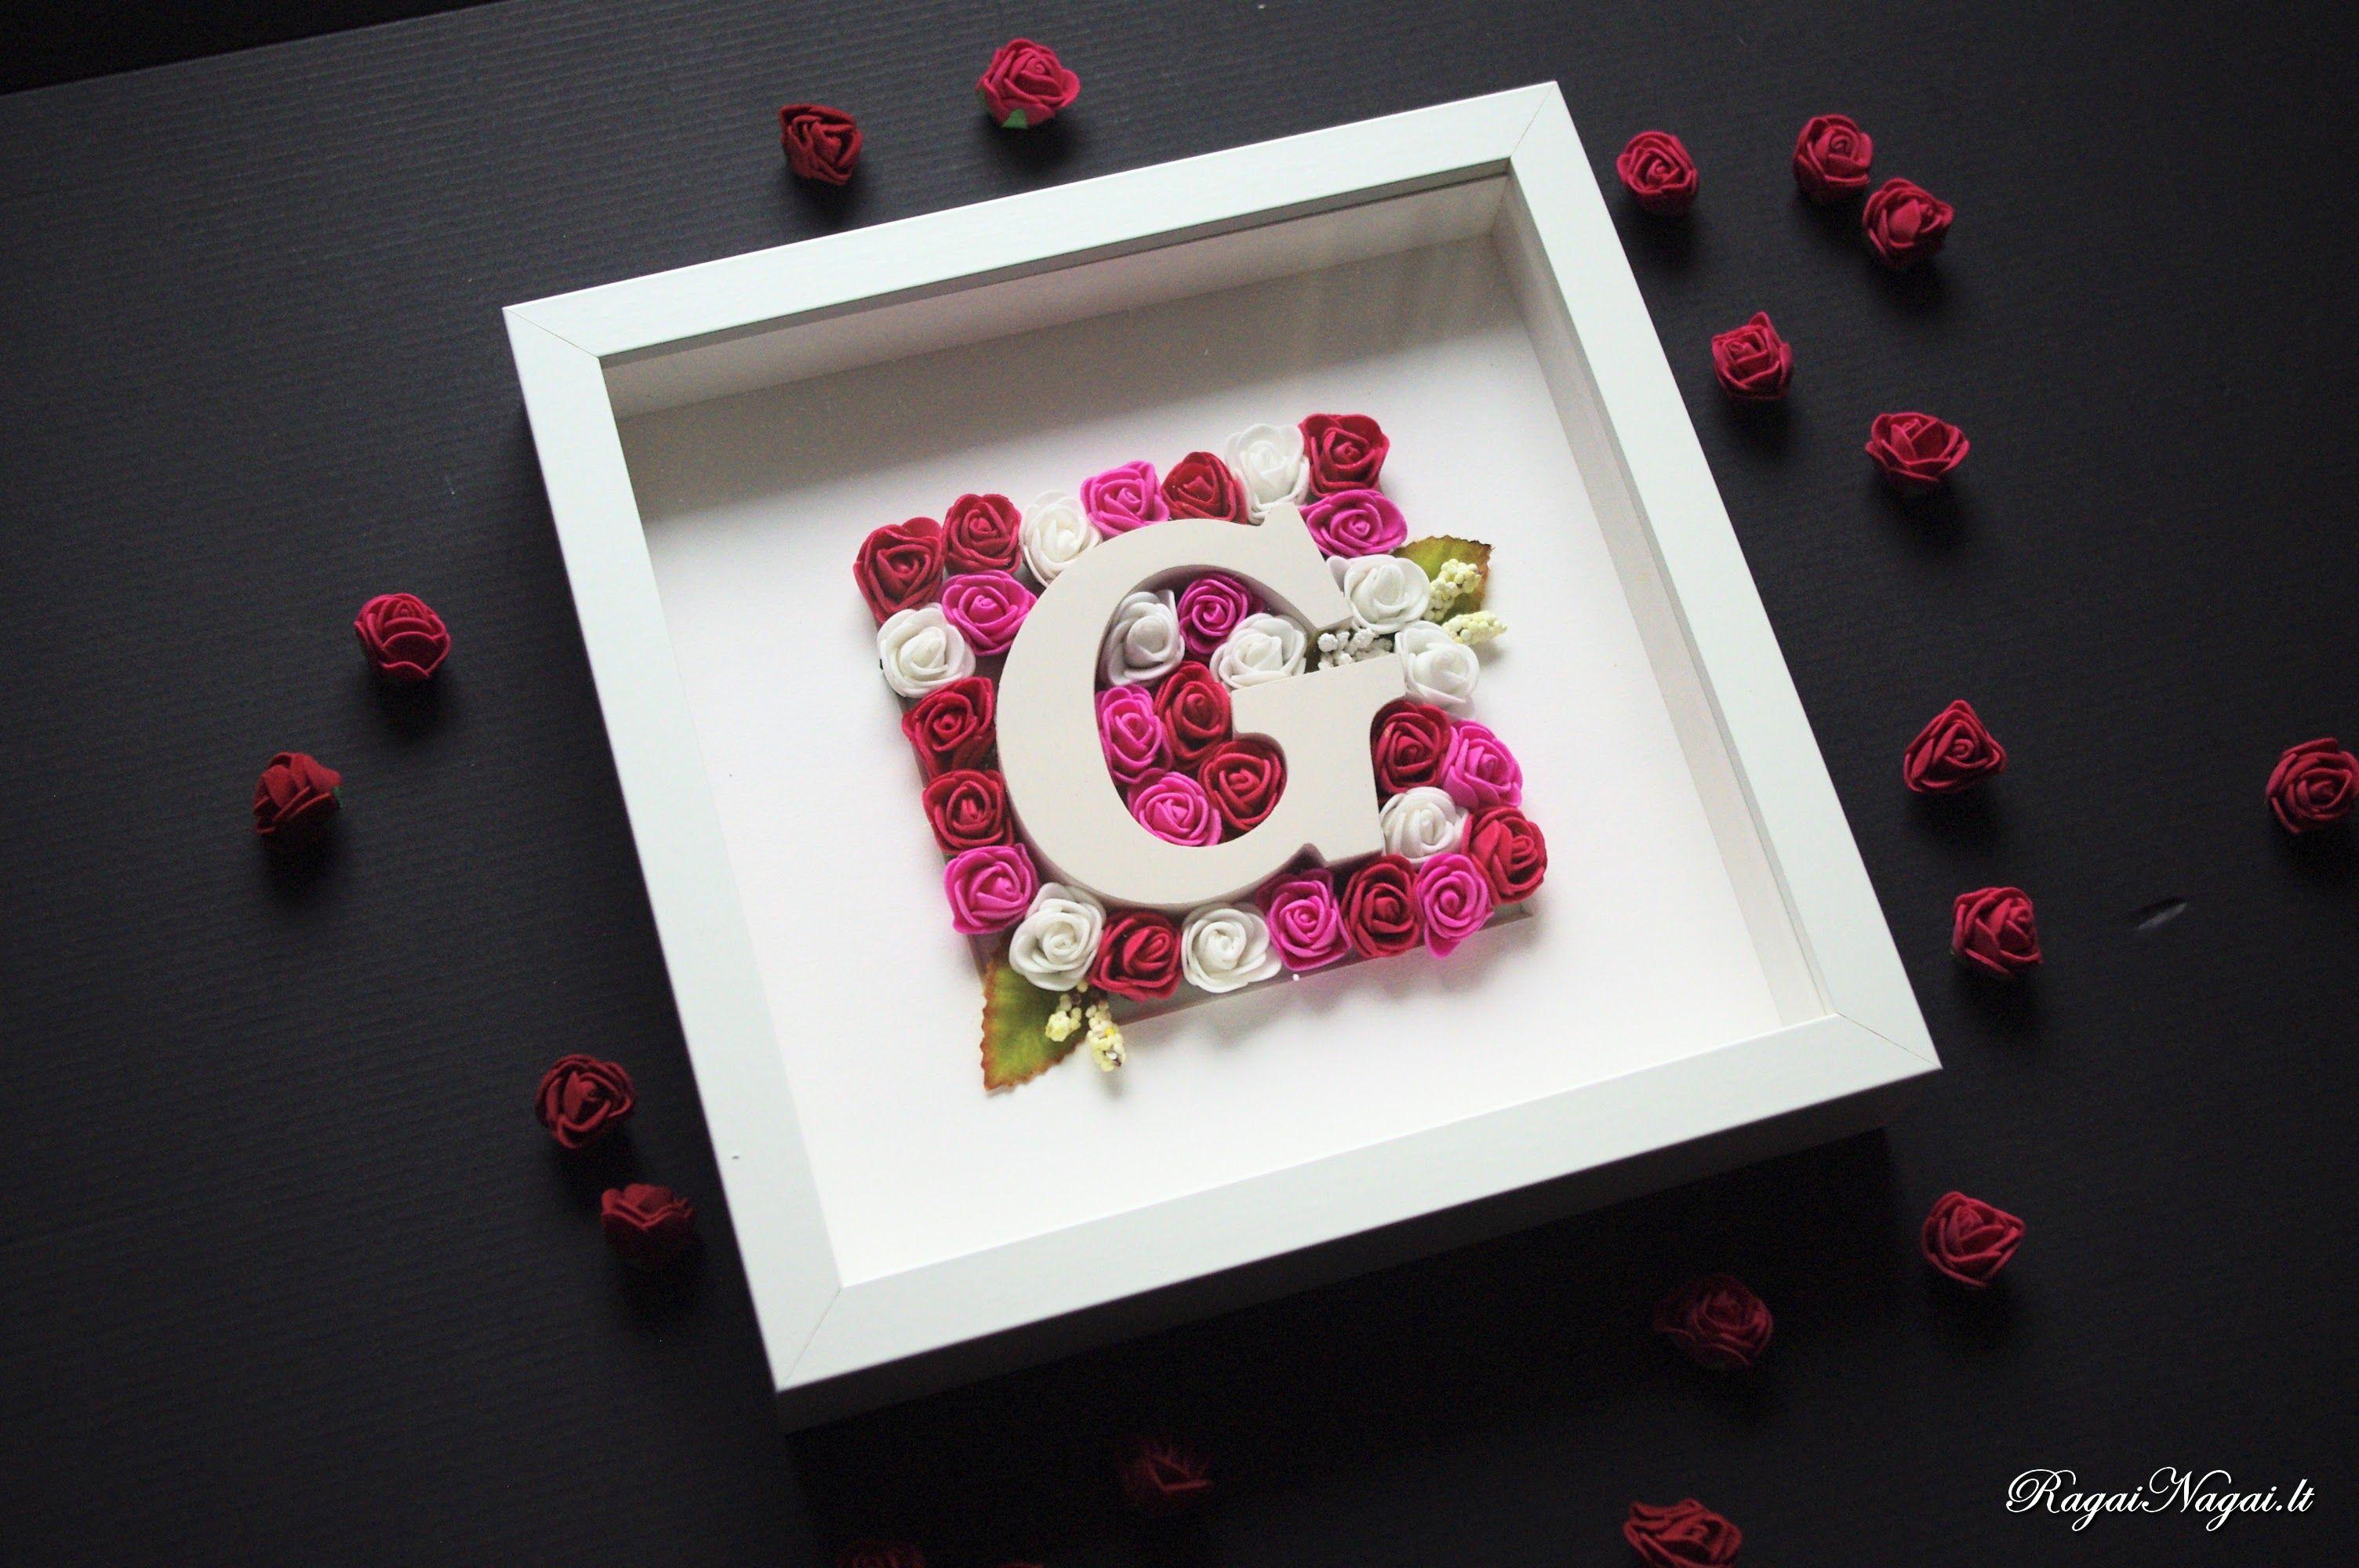 L_dirbtinemis rozemis dekoruoti remeliai,G raide,vienetine dovana_RagaiNagai_Lt (2)